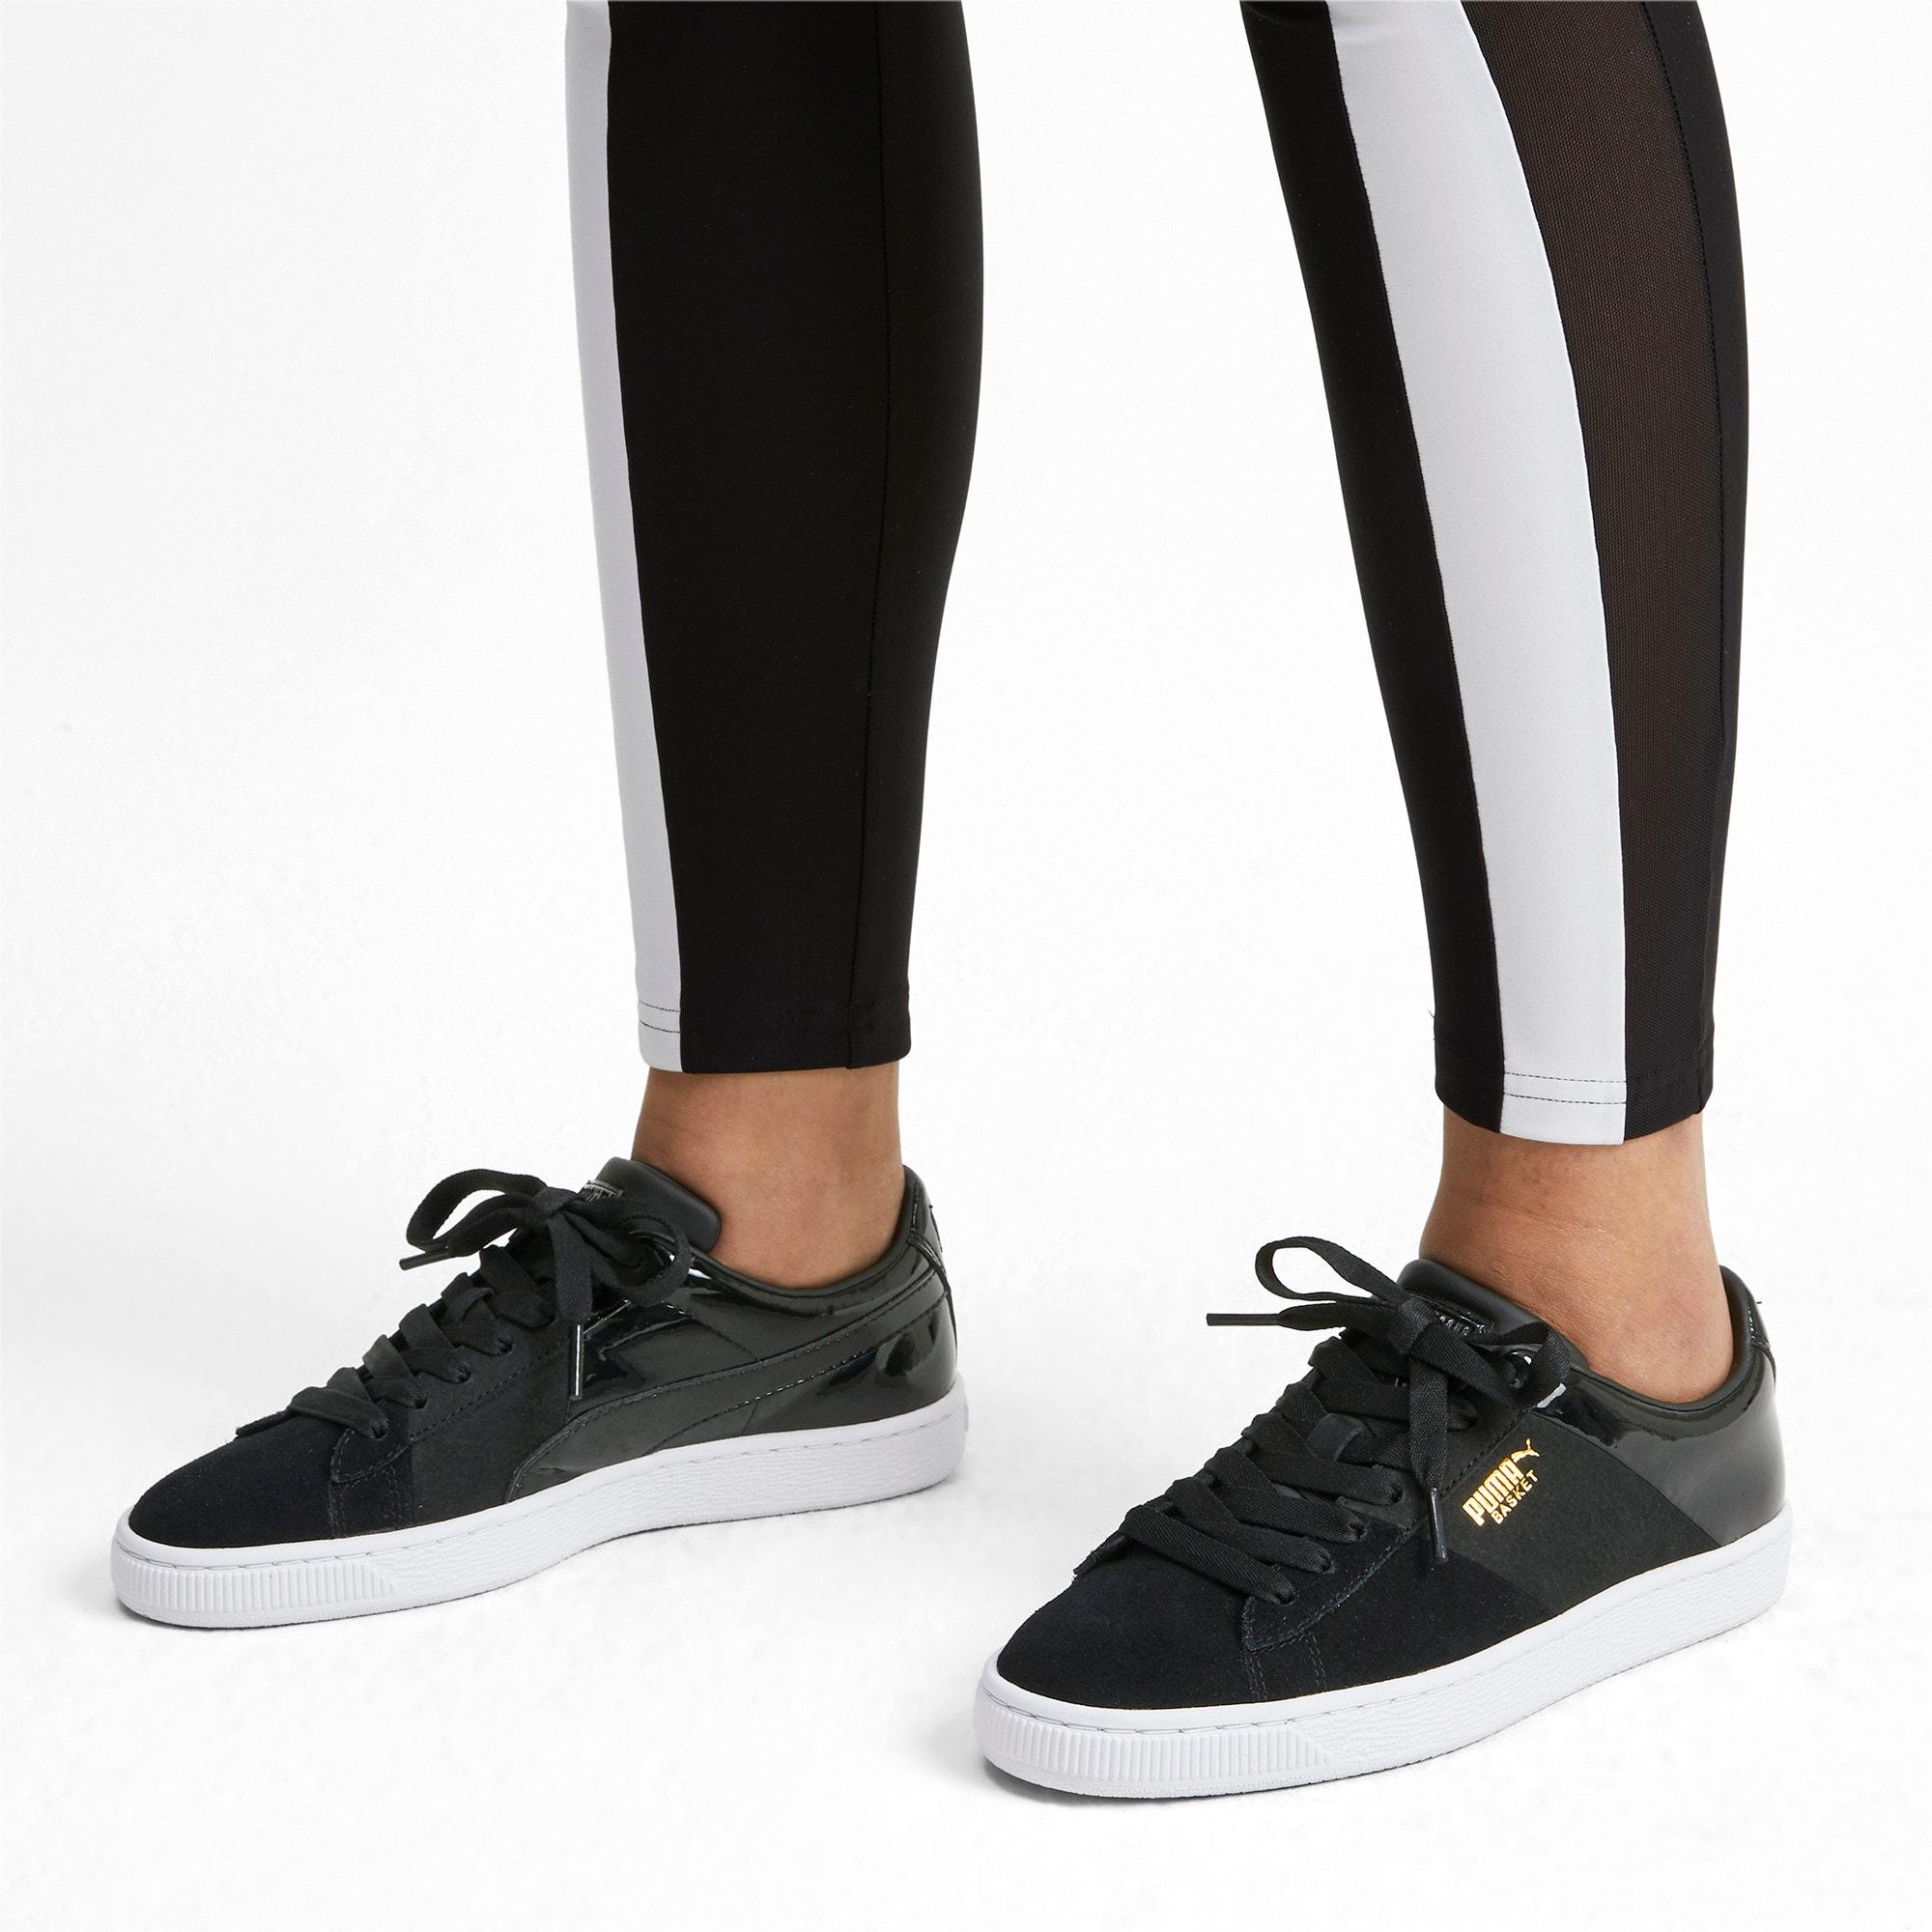 Thumbnail 2 of Basket Remix Women's Sneakers, Puma Black-Puma Team Gold, medium